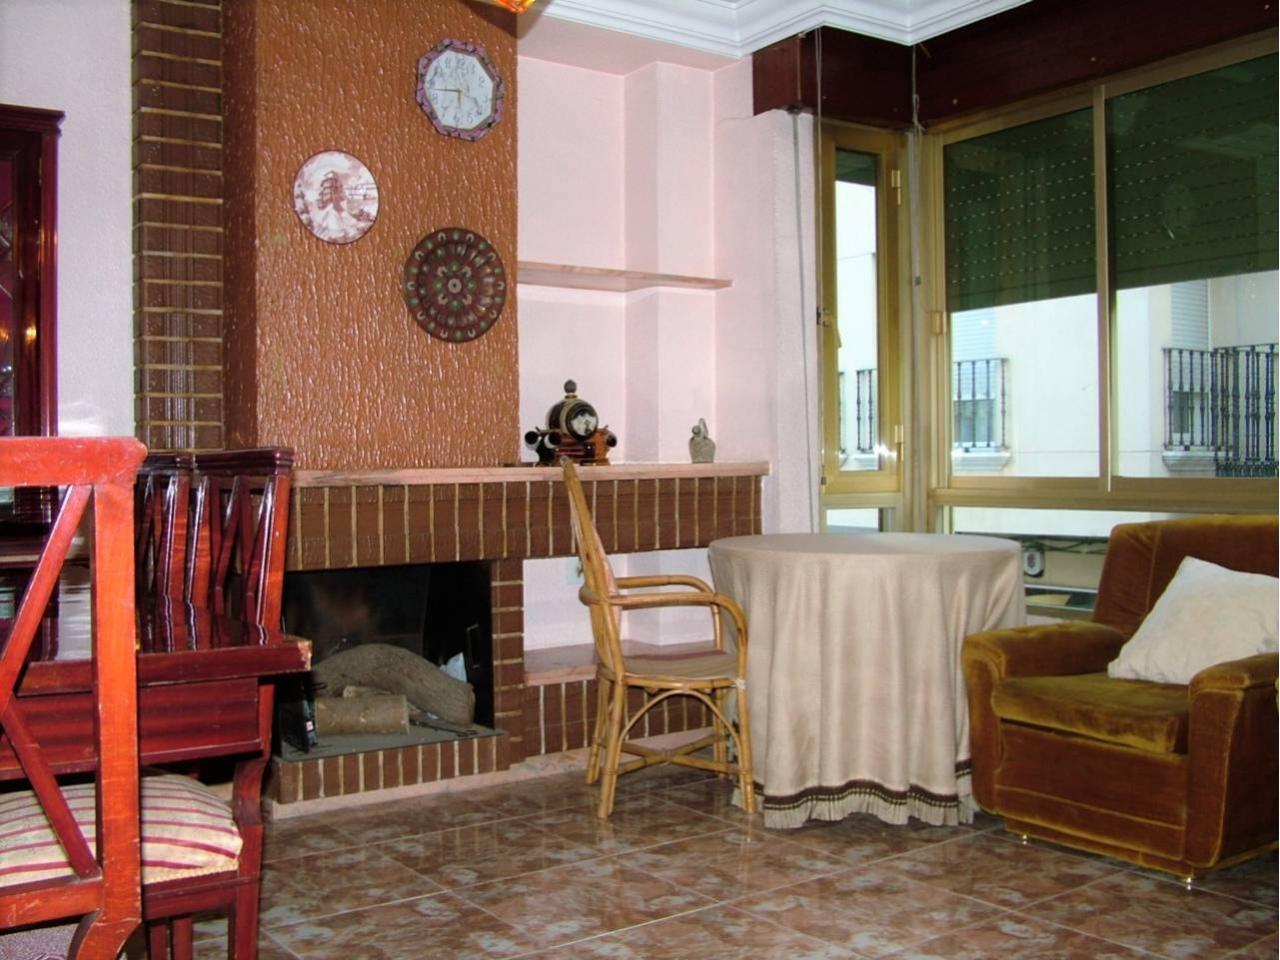 Muebles Bigastro - Inmobiliaria Gessicon Piso En Alquiler En Bigastro Por 350 Mes [mjhdah]http://ritamarproperties.com/media/images/properties/o_1auvetcup6rs1eip101nkkm1luh1s.jpg